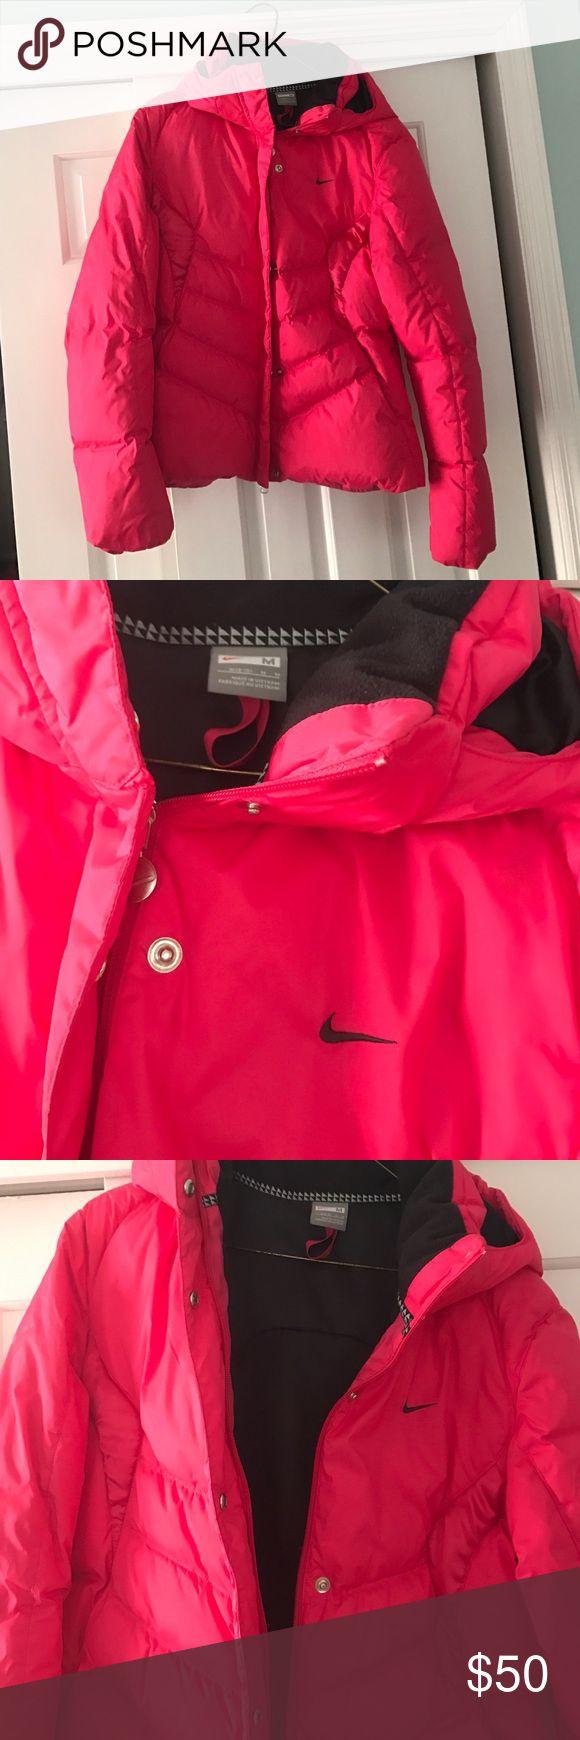 Nike Winter coat perfect condition, worn twice Nike Jackets & Coats Puffers